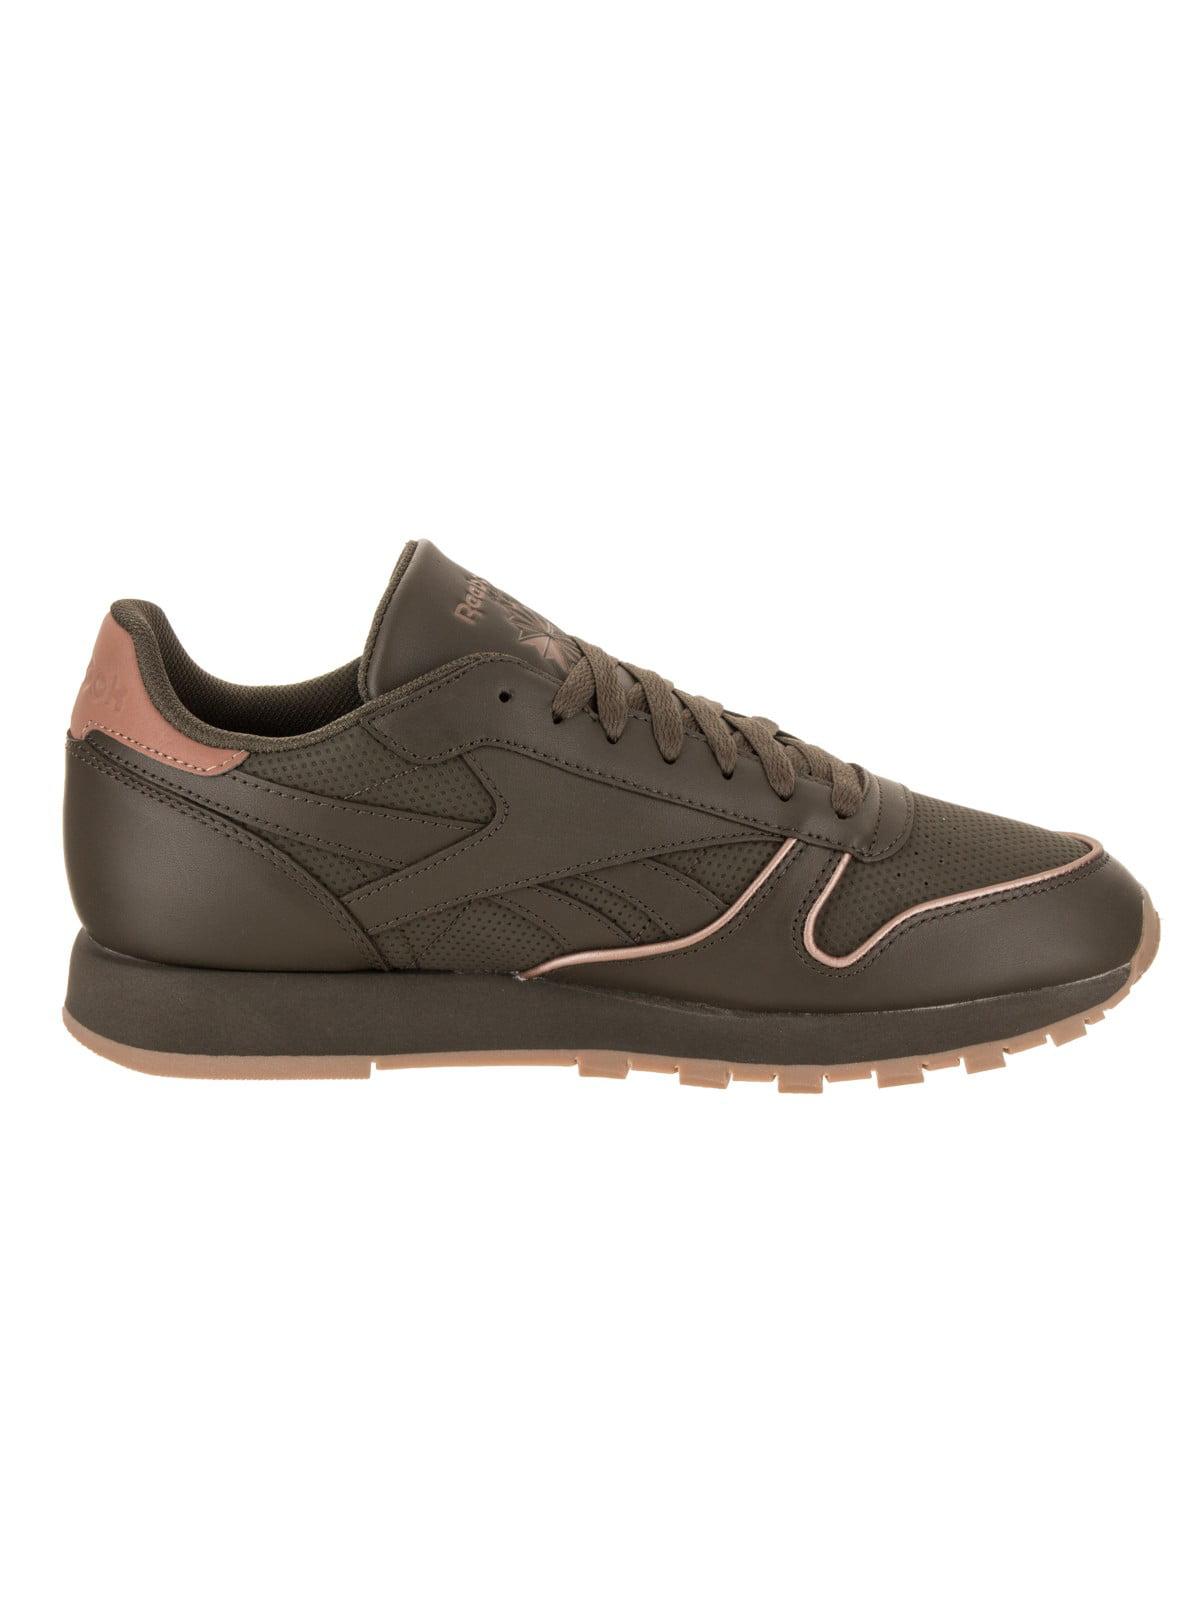 6fe295937bc Reebok - Reebok Men s Classic Leather Rm Casual Shoe - Walmart.com